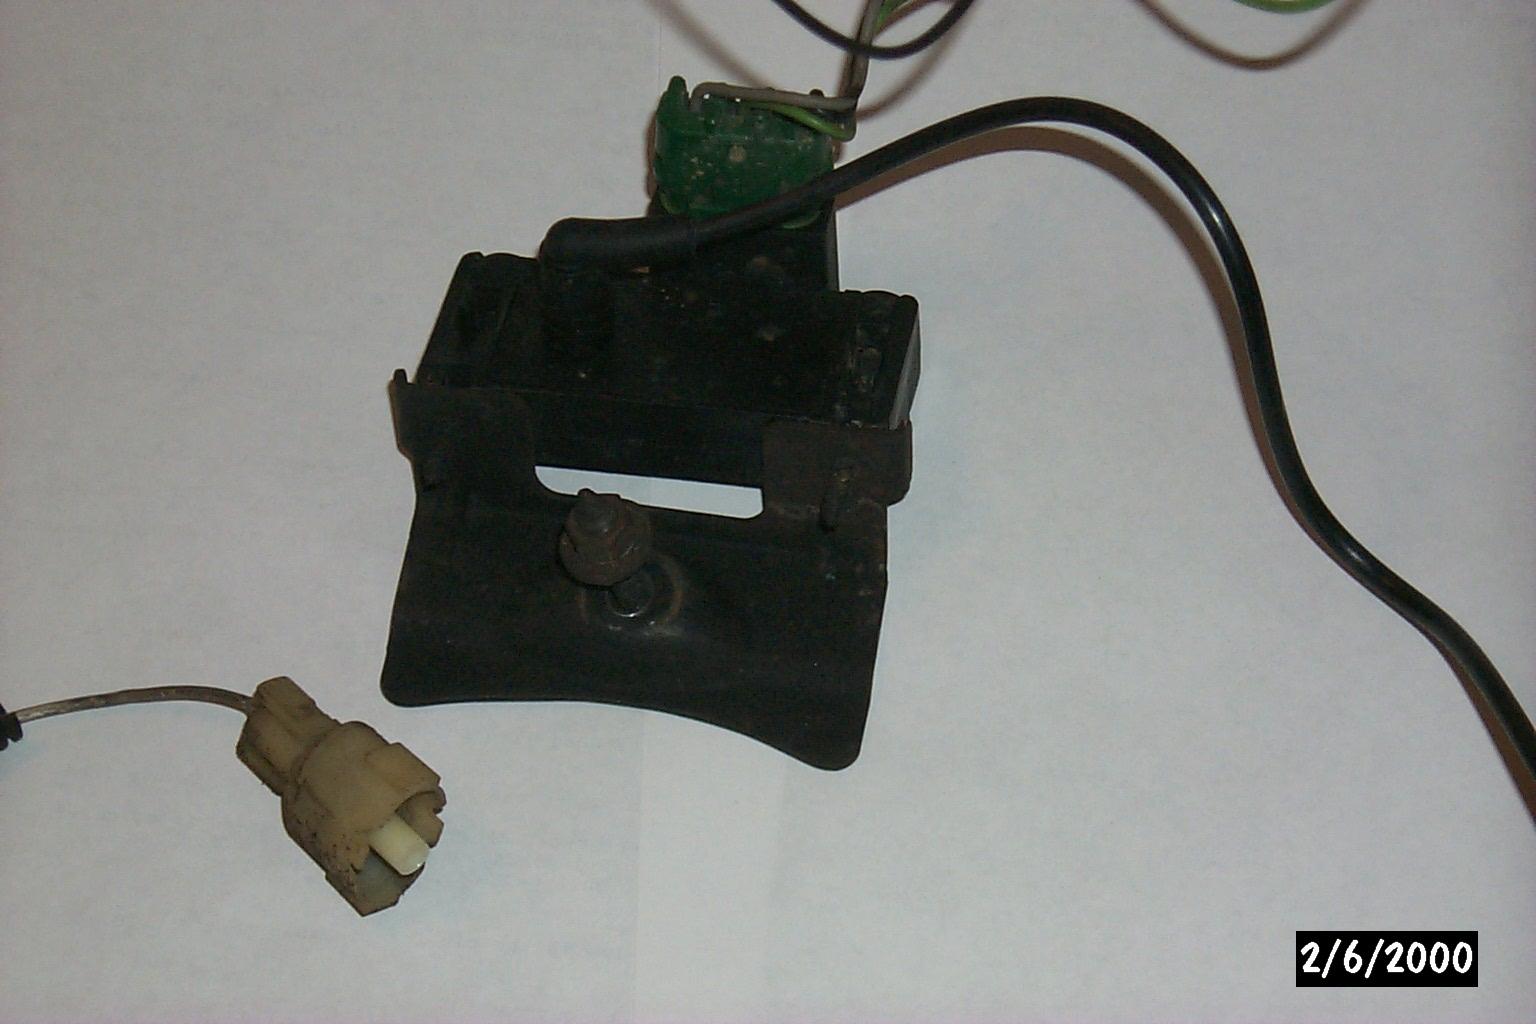 bosch map sensor wiring diagram 99 grand cherokee stereo 4 wire fuse